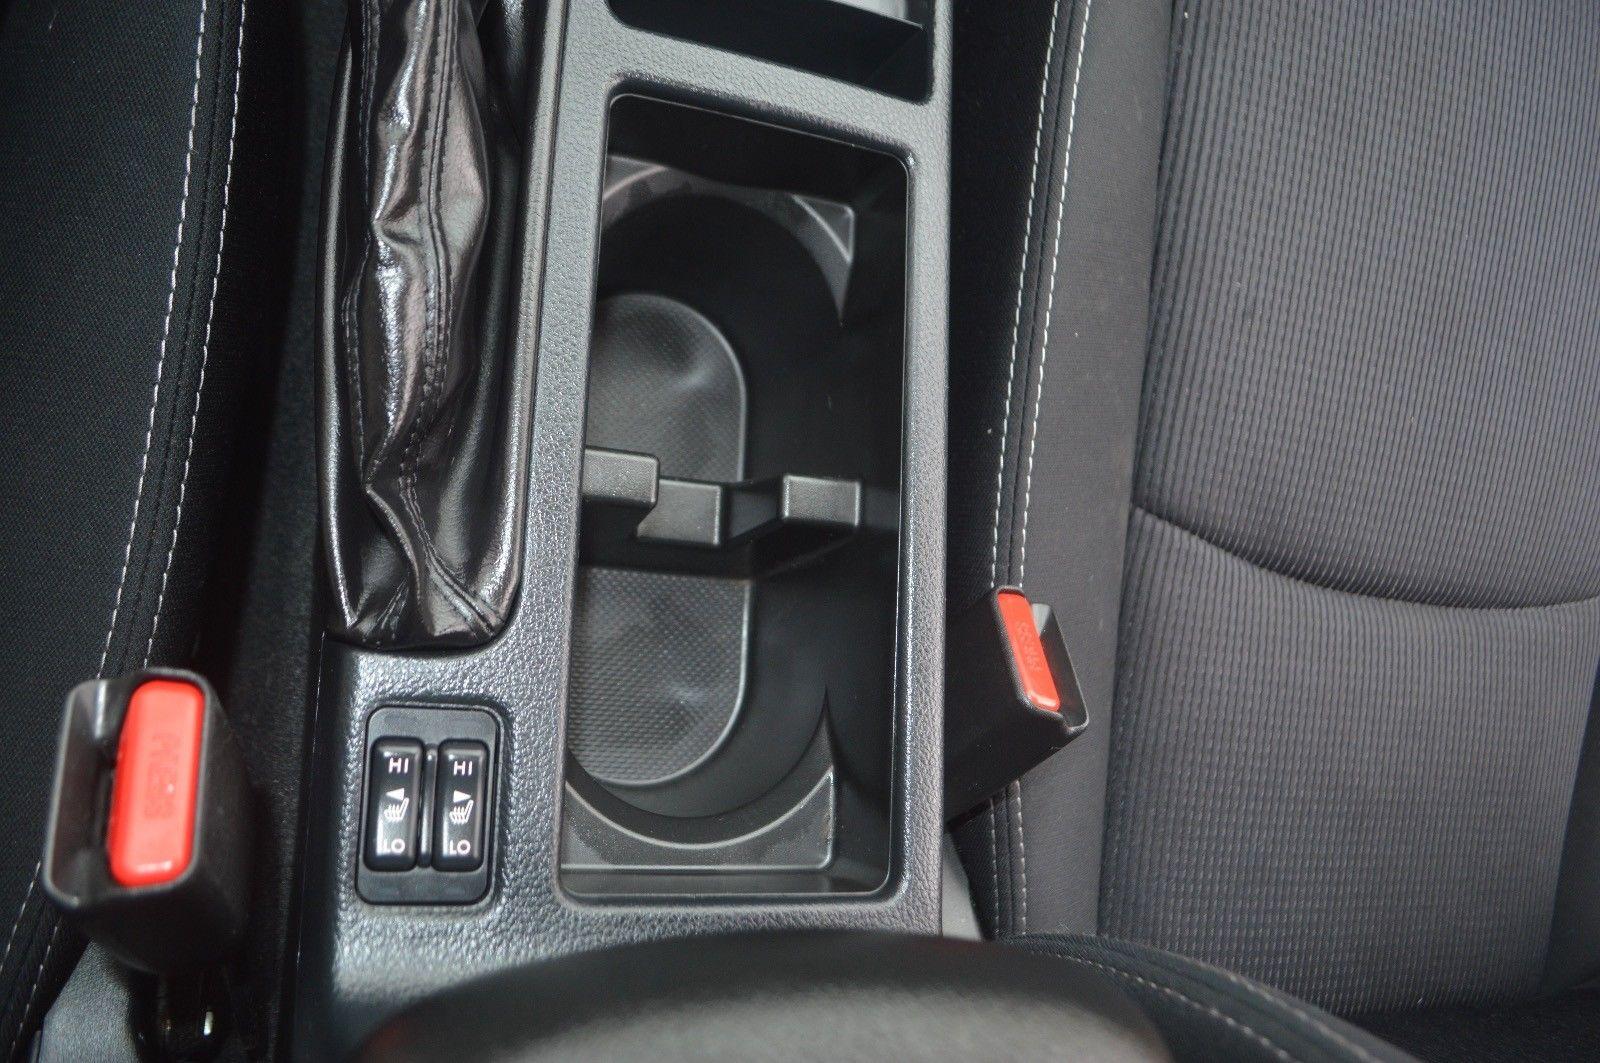 Used Toyota Prius For Sale >> Awesome 2015 Subaru Impreza 2.0i Sport Premium 2015 Subaru ...